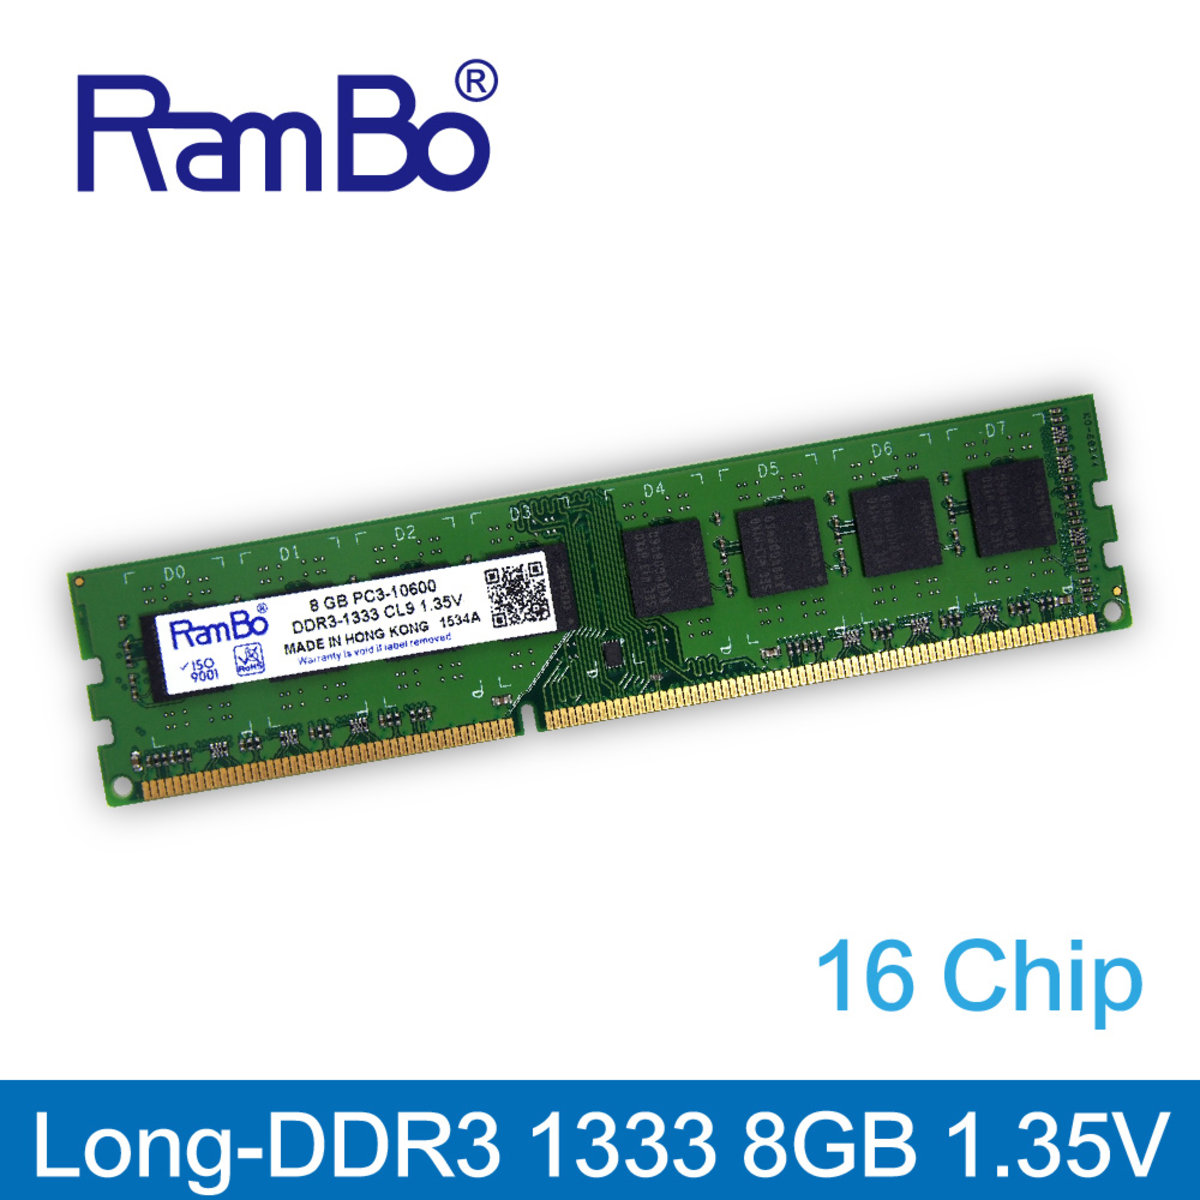 8GB DDR3 1333MHz Long DIMM 16-Chip 1.35V Memory for PC Desktop